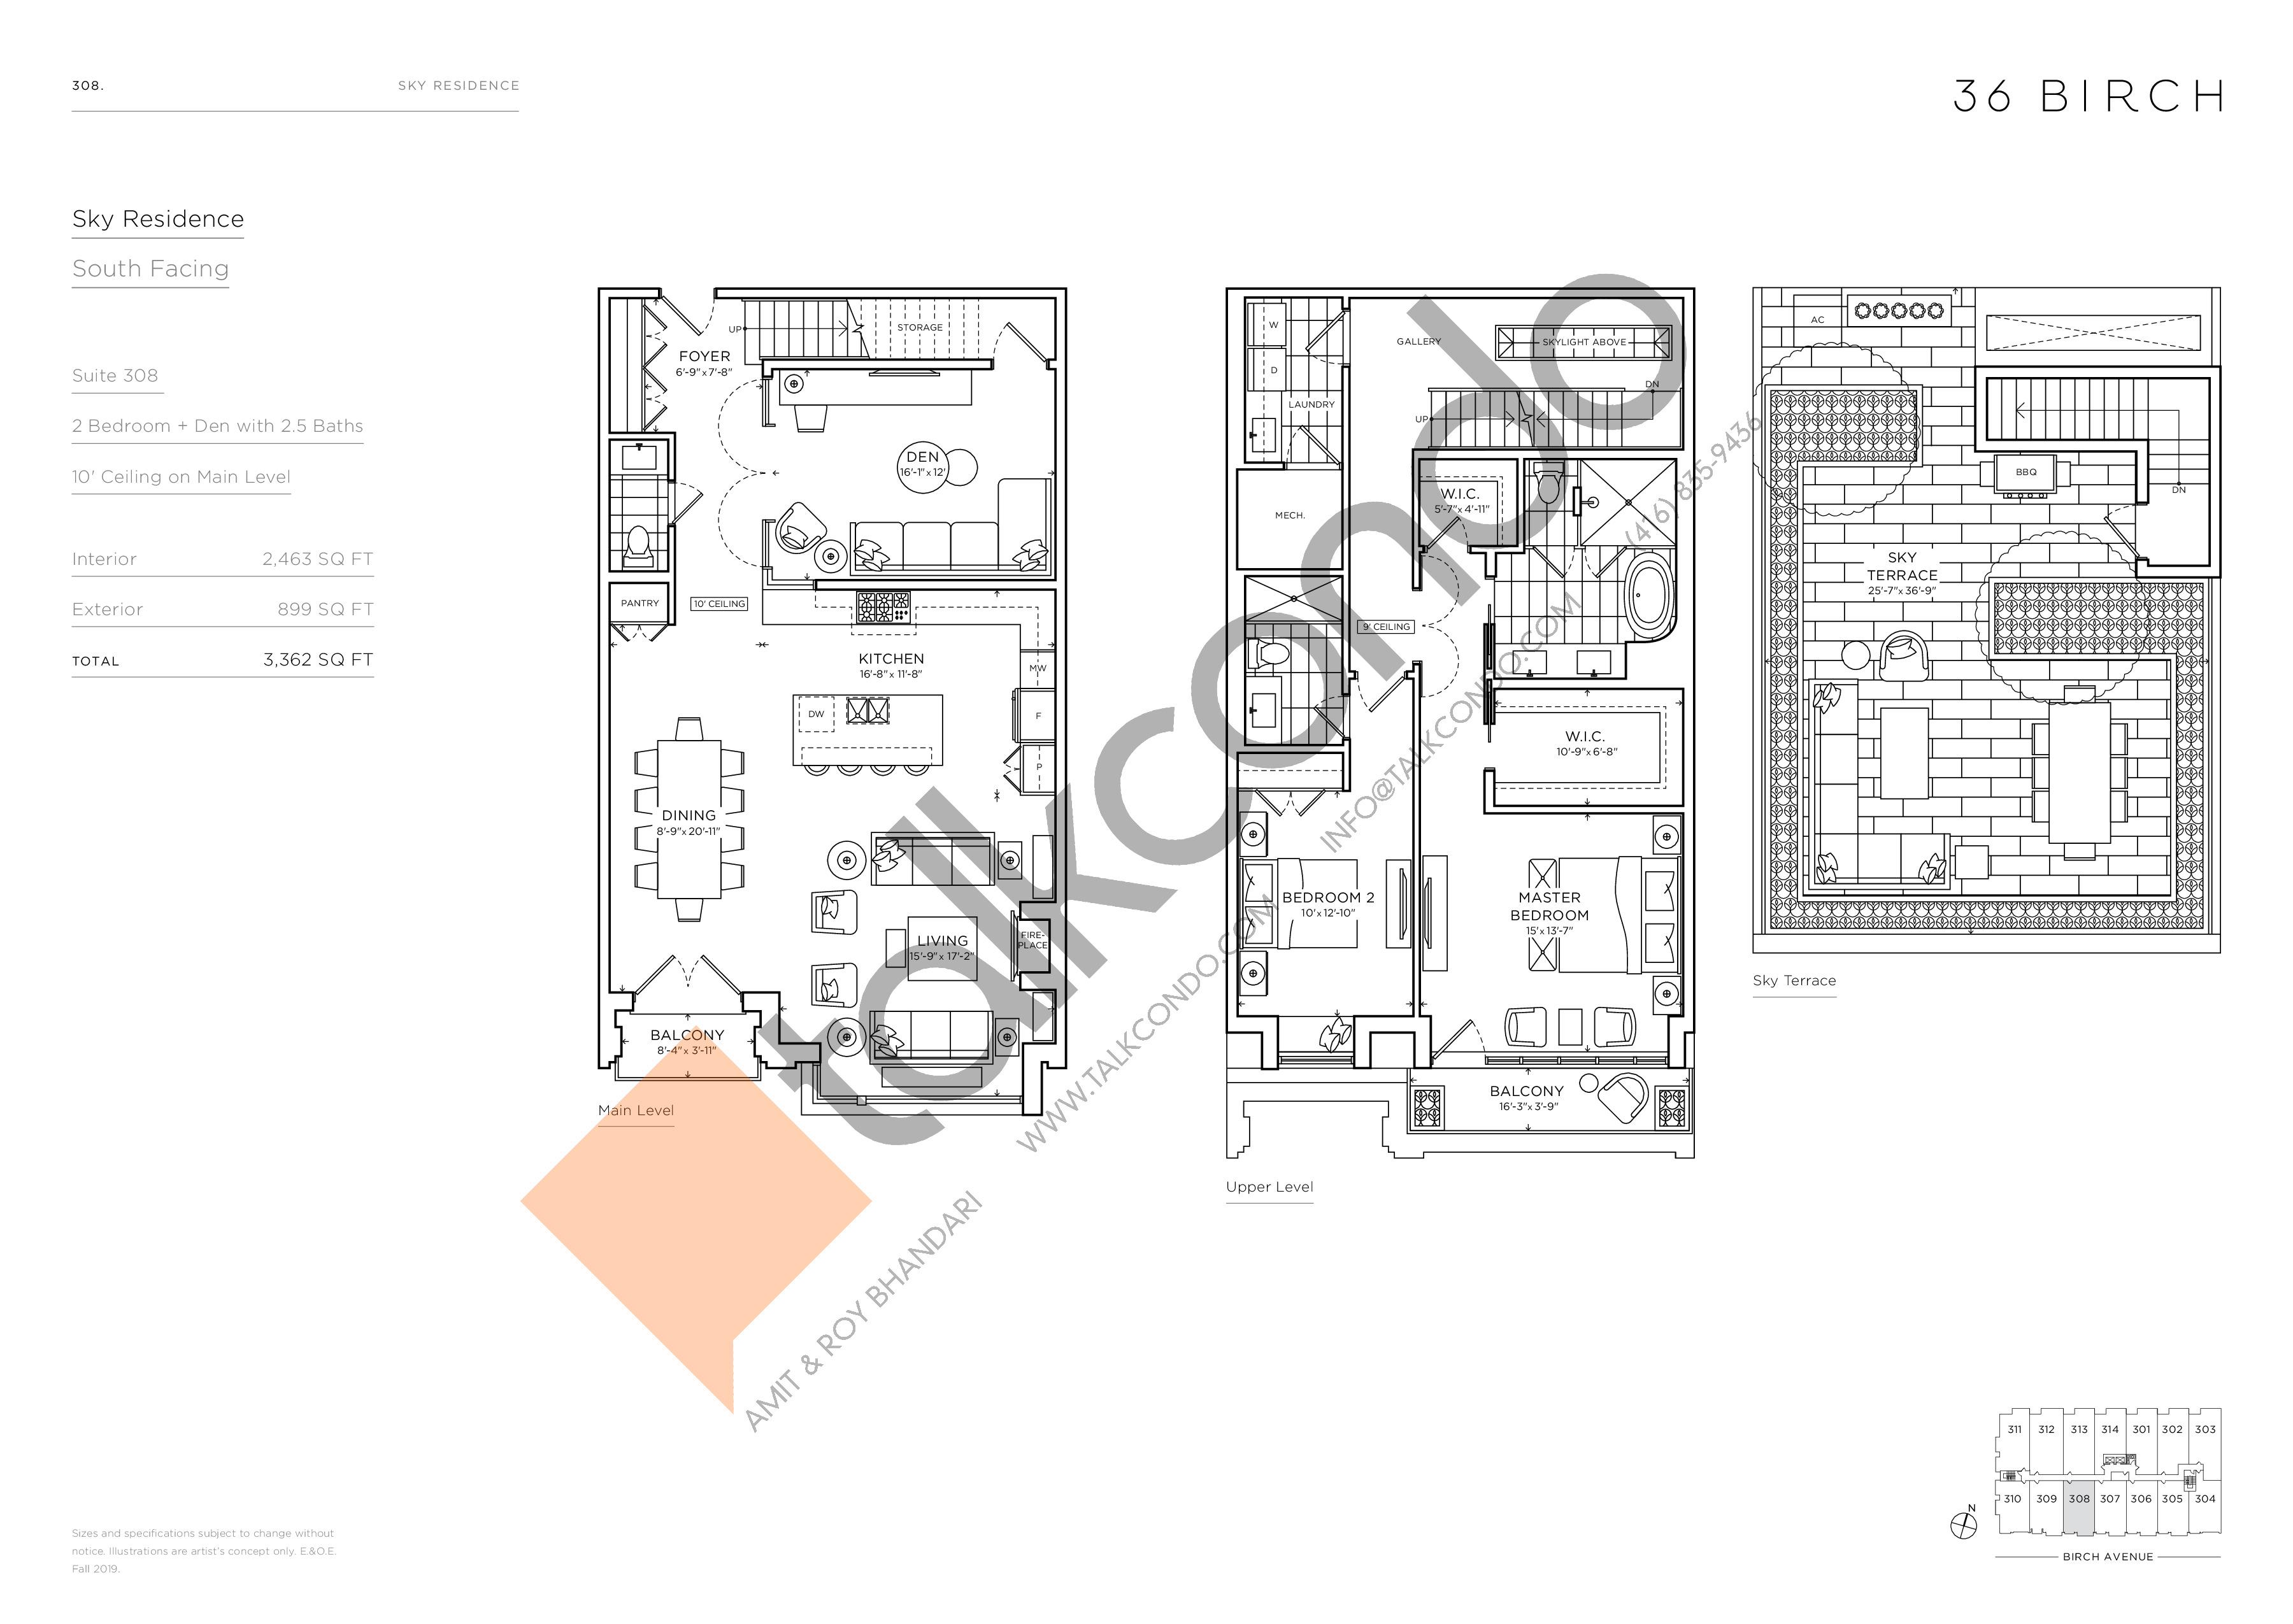 308 - Sky Residence Floor Plan at 36 Birch Condos - 2463 sq.ft